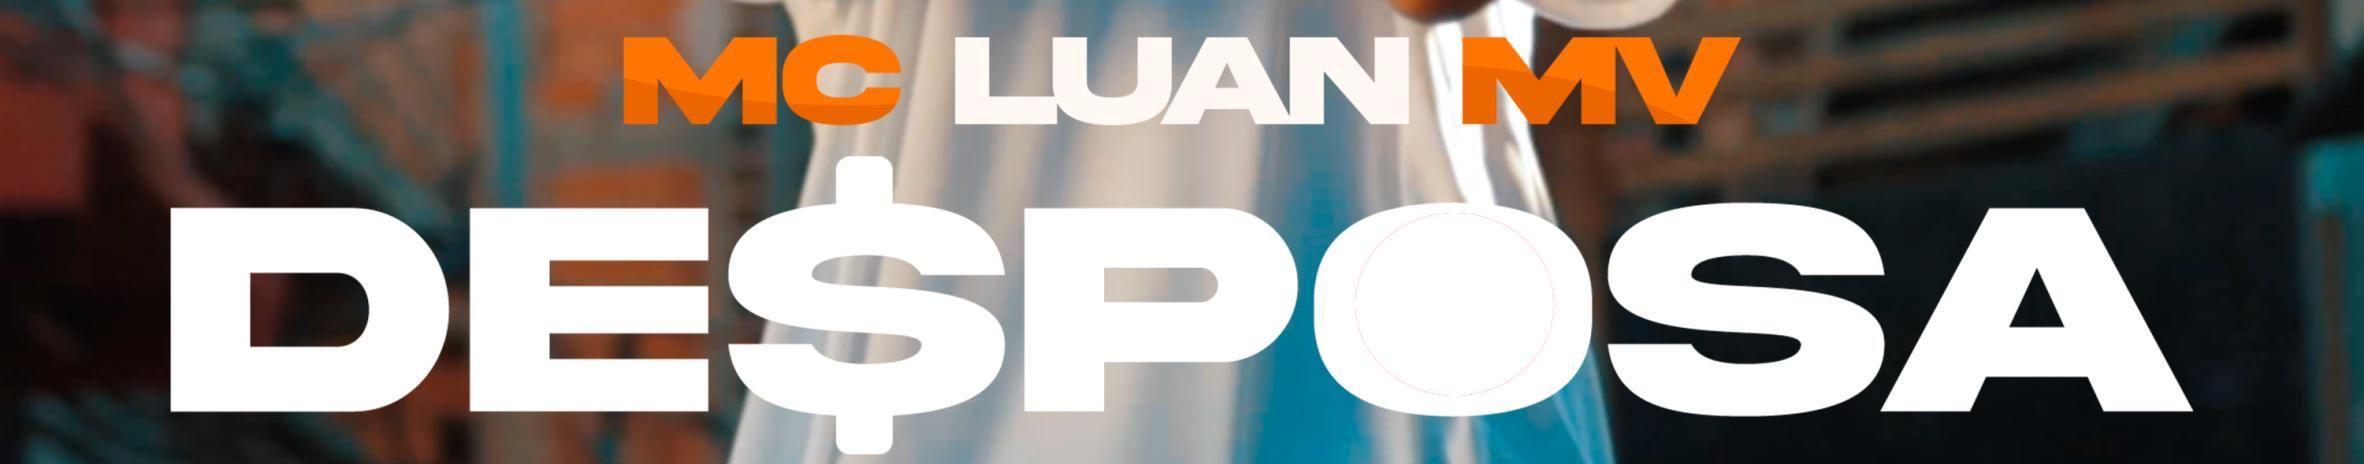 Imagem de capa de MC Luan MV